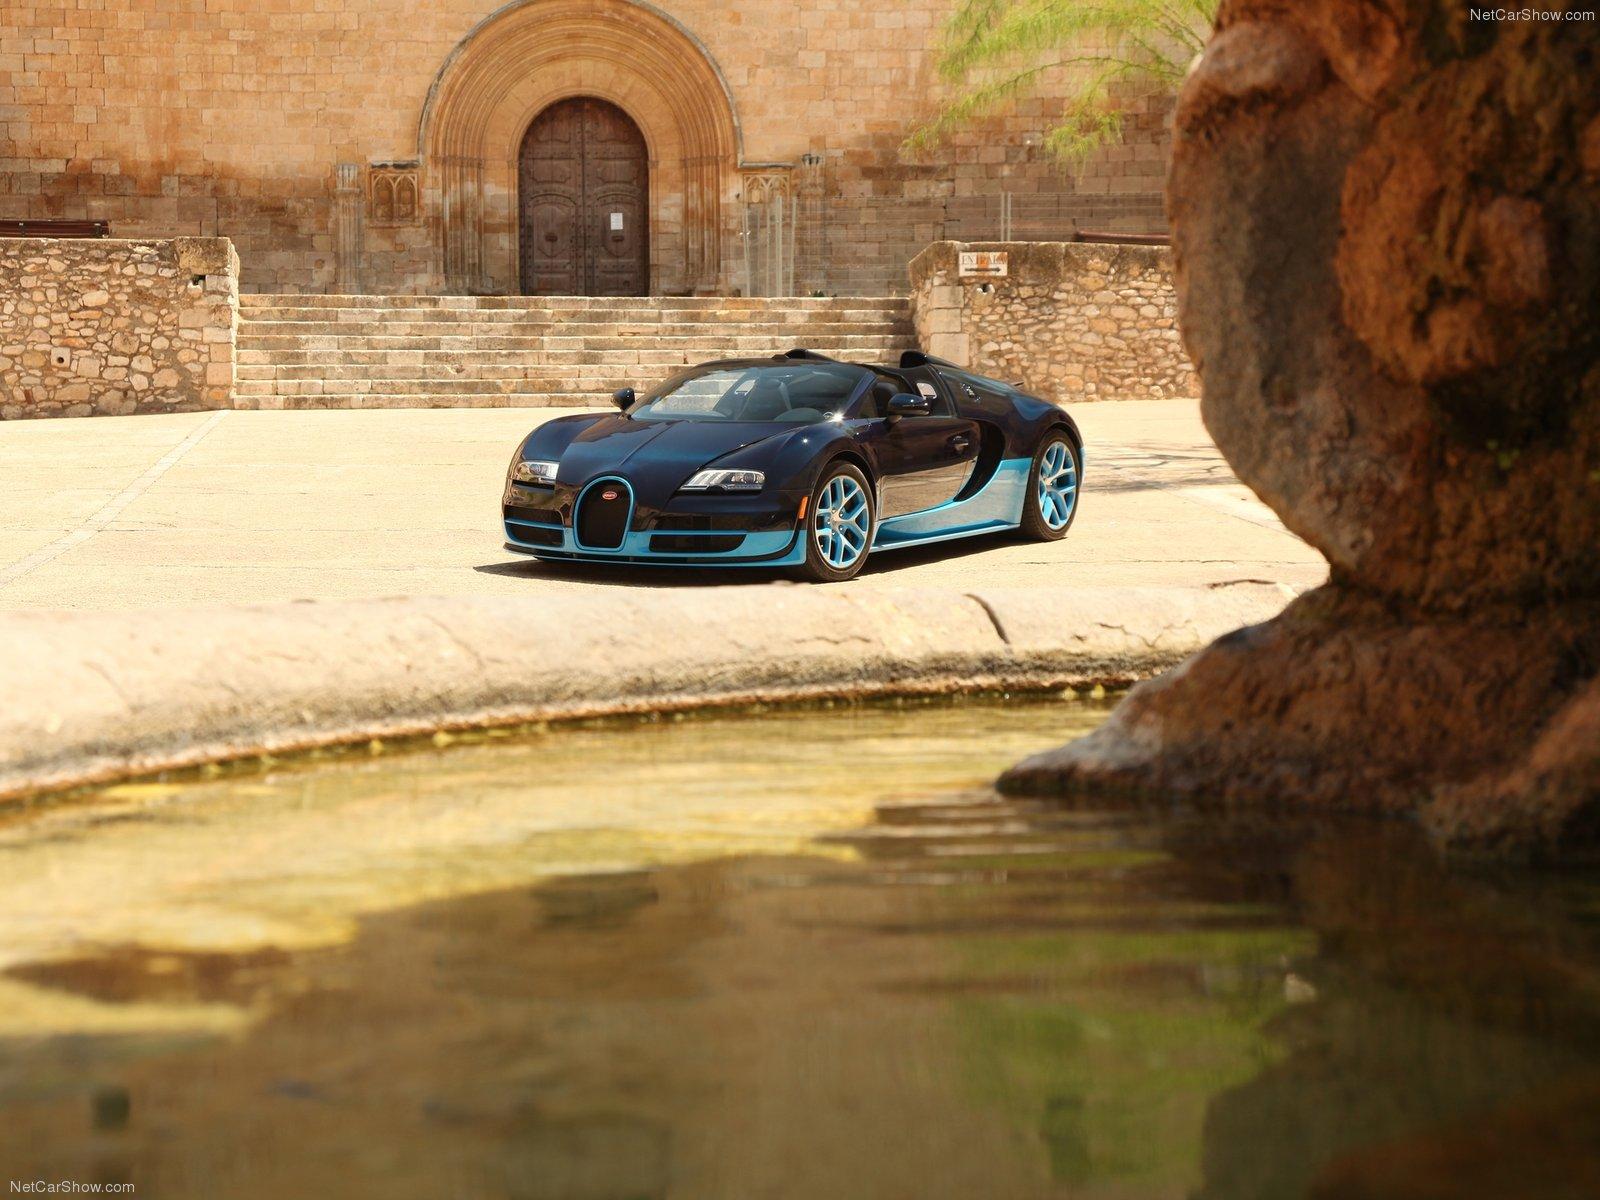 2012%2BBugatti%2BVeyron%2BGrand%2BSport%2BVitesse%2B%25285%2529 Astounding Xe Bugatti Veyron Grand Sport Vitesse Cars Trend